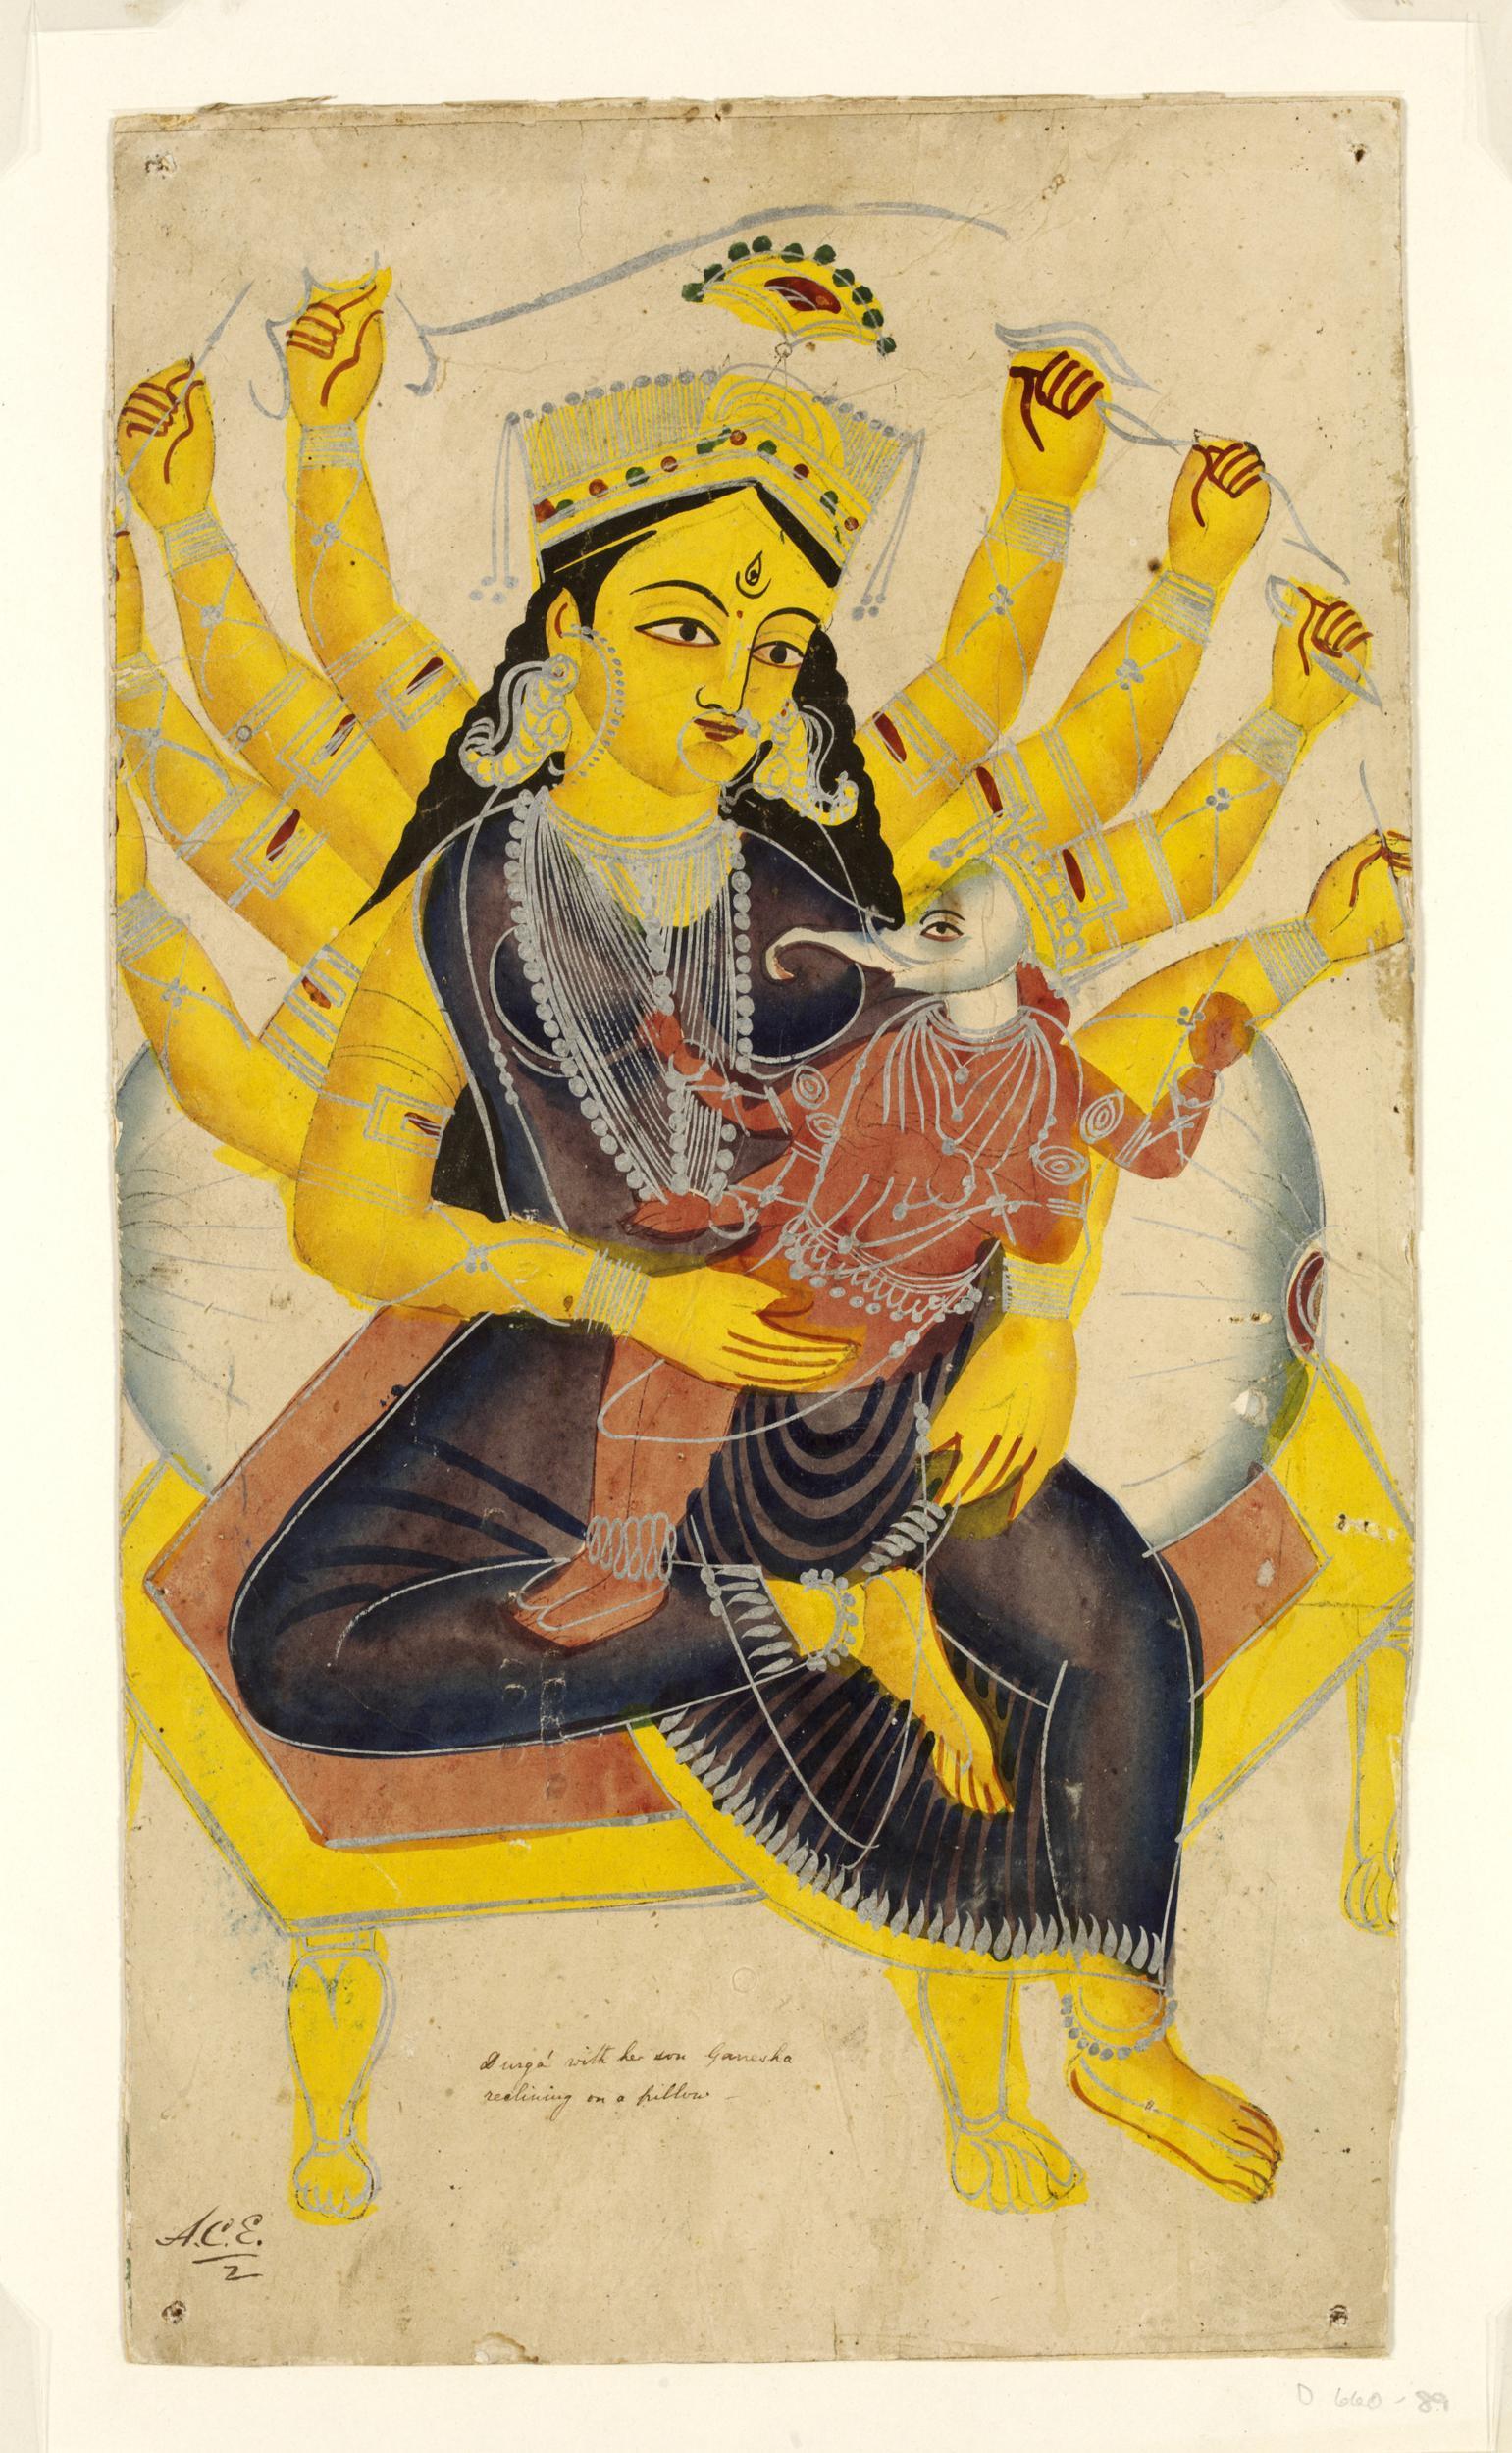 Durga holding Genesha in her Lap - Kalighat Painting, Calcutta (Kolkata), c1850